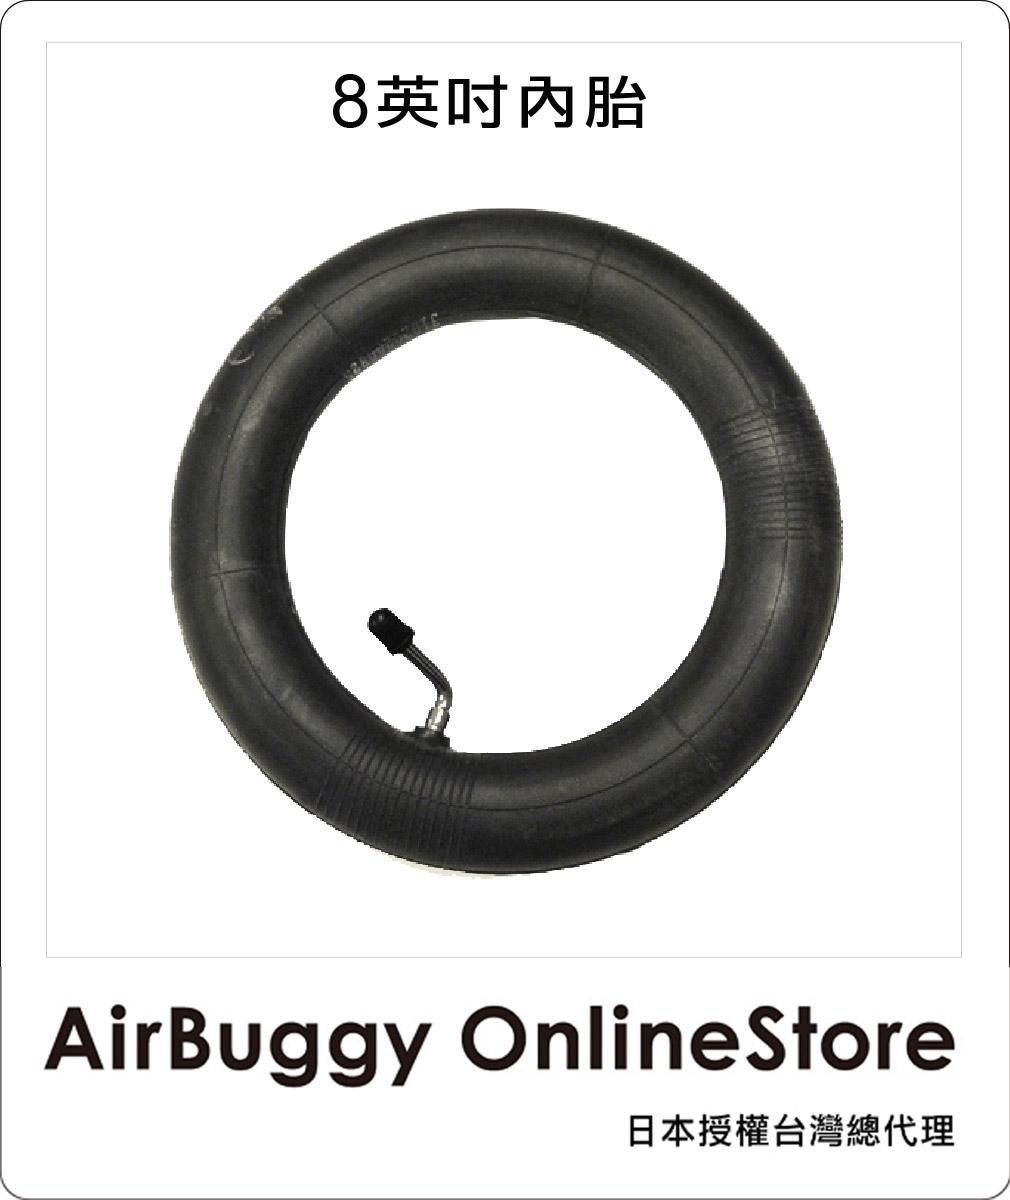 AirBuggy 8英吋內胎(Coco,Safari,Twinkle)